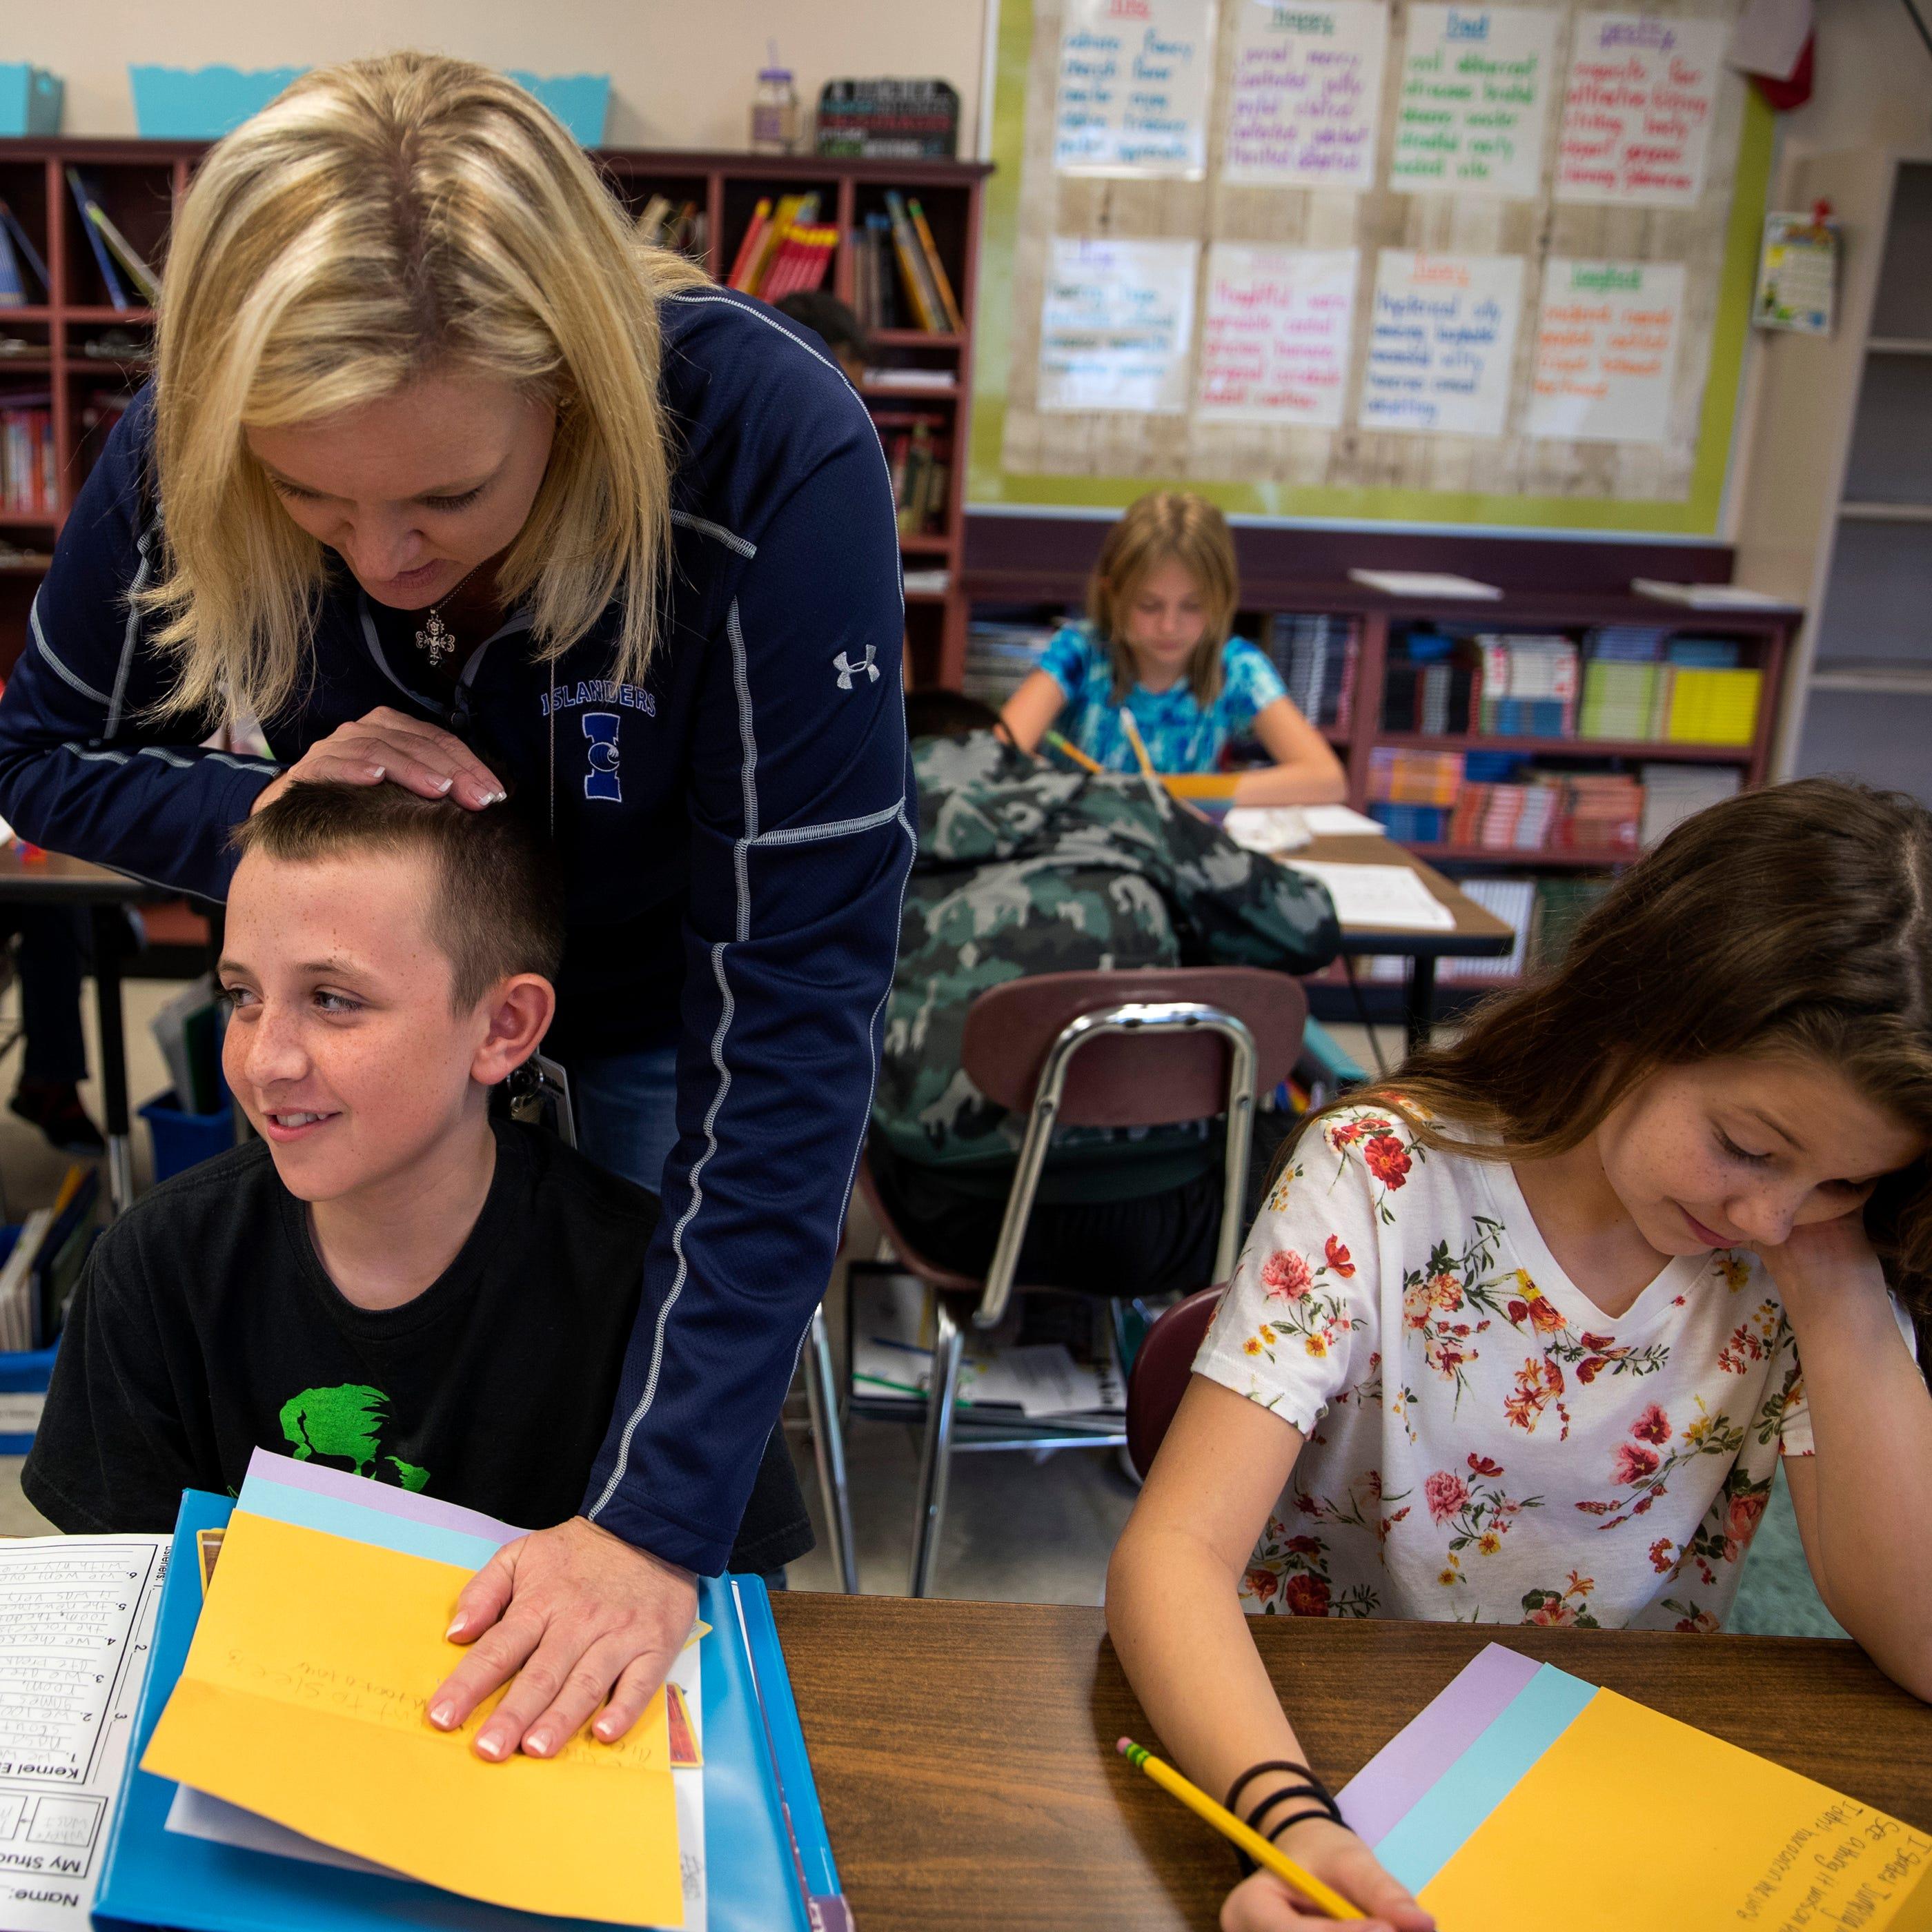 This Texas teacher took a $30K pay cut to keep teaching, now she's also a cashier